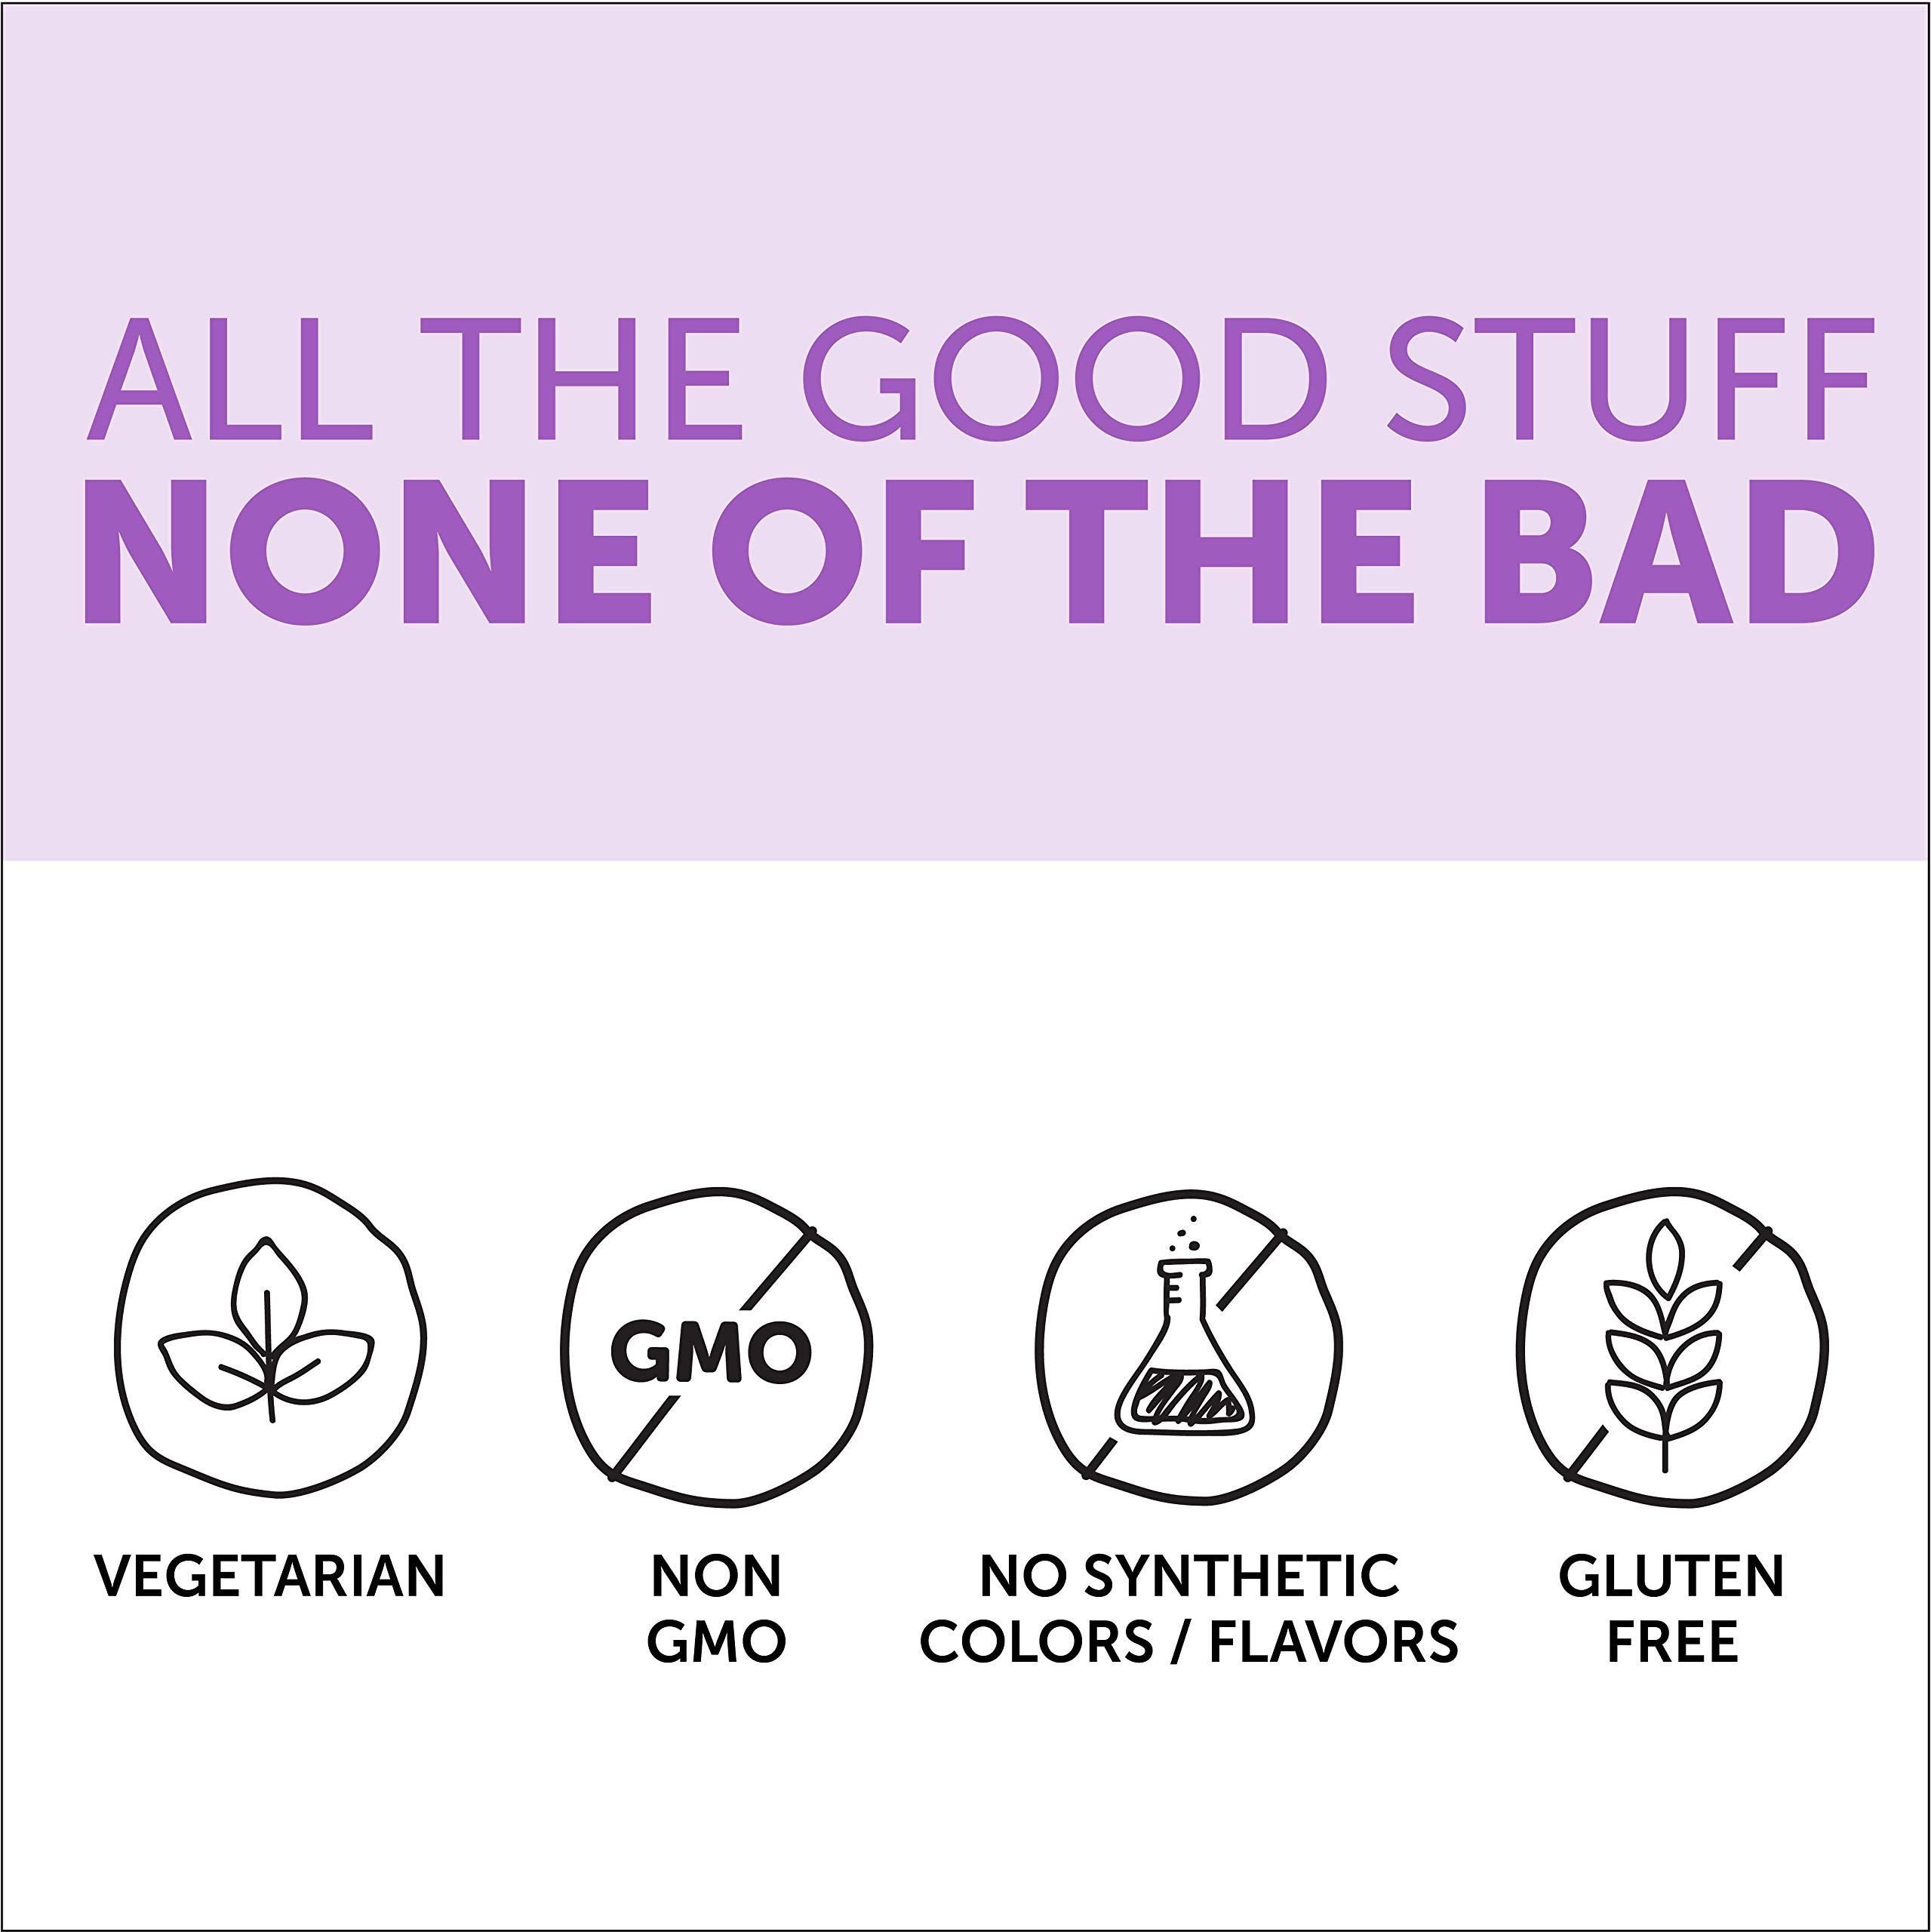 SmartyPants Vegetarian Organic Kids Daily Gummy Vitamins: Multivitamin, Gluten Free, Non-GMO, Omega-3, Probiotic, Vitamin D3, Methylcobalamin B12, Zinc; 120 Count (30 Day Supply) by SmartyPants Vitamins (Image #8)